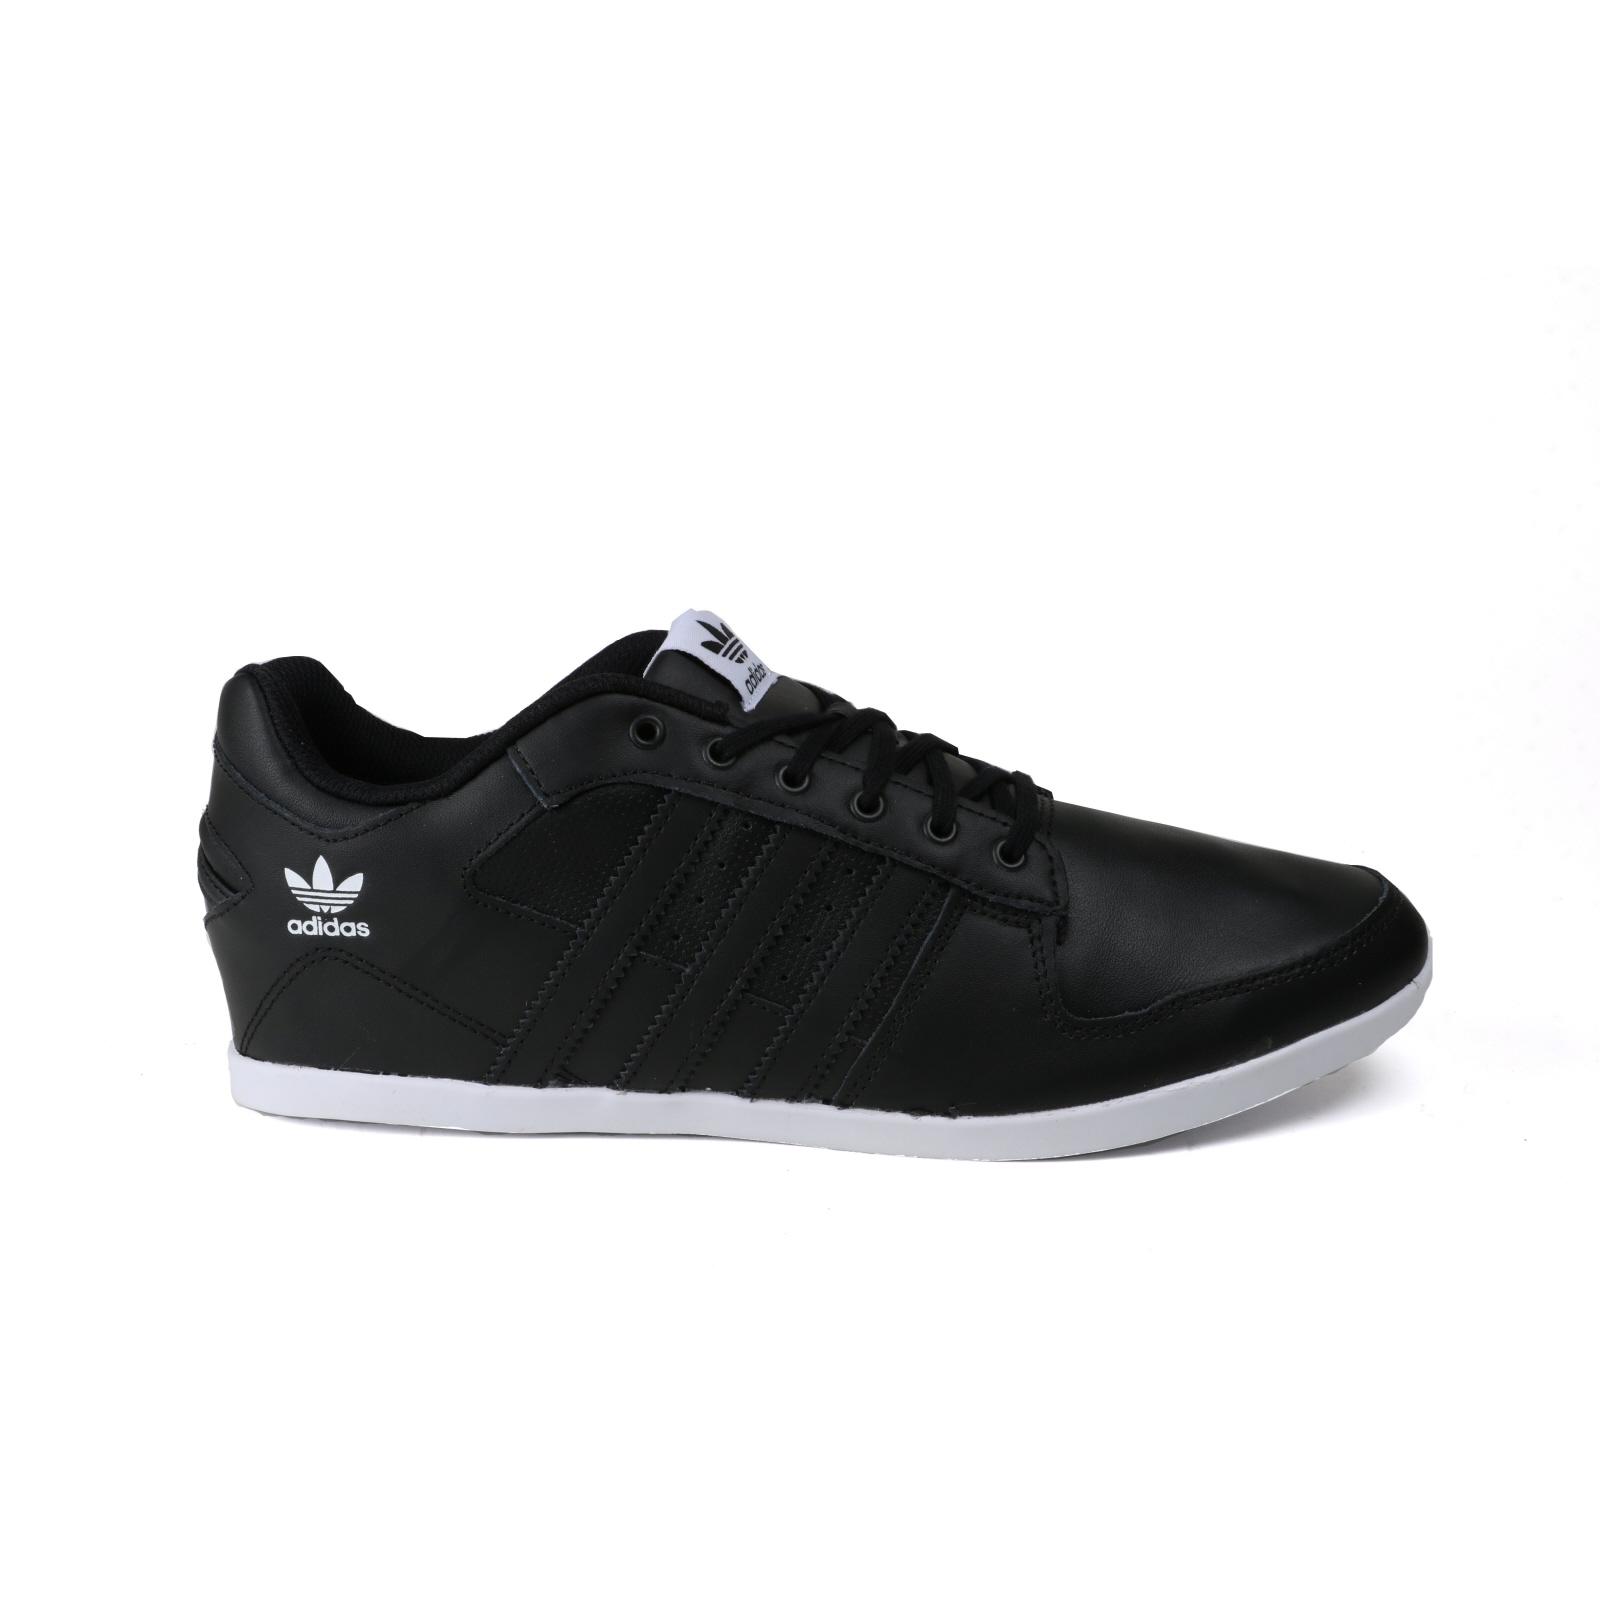 Adidas Plimcana 2.0 Low M25813, Herren Sneaker EU 49 13